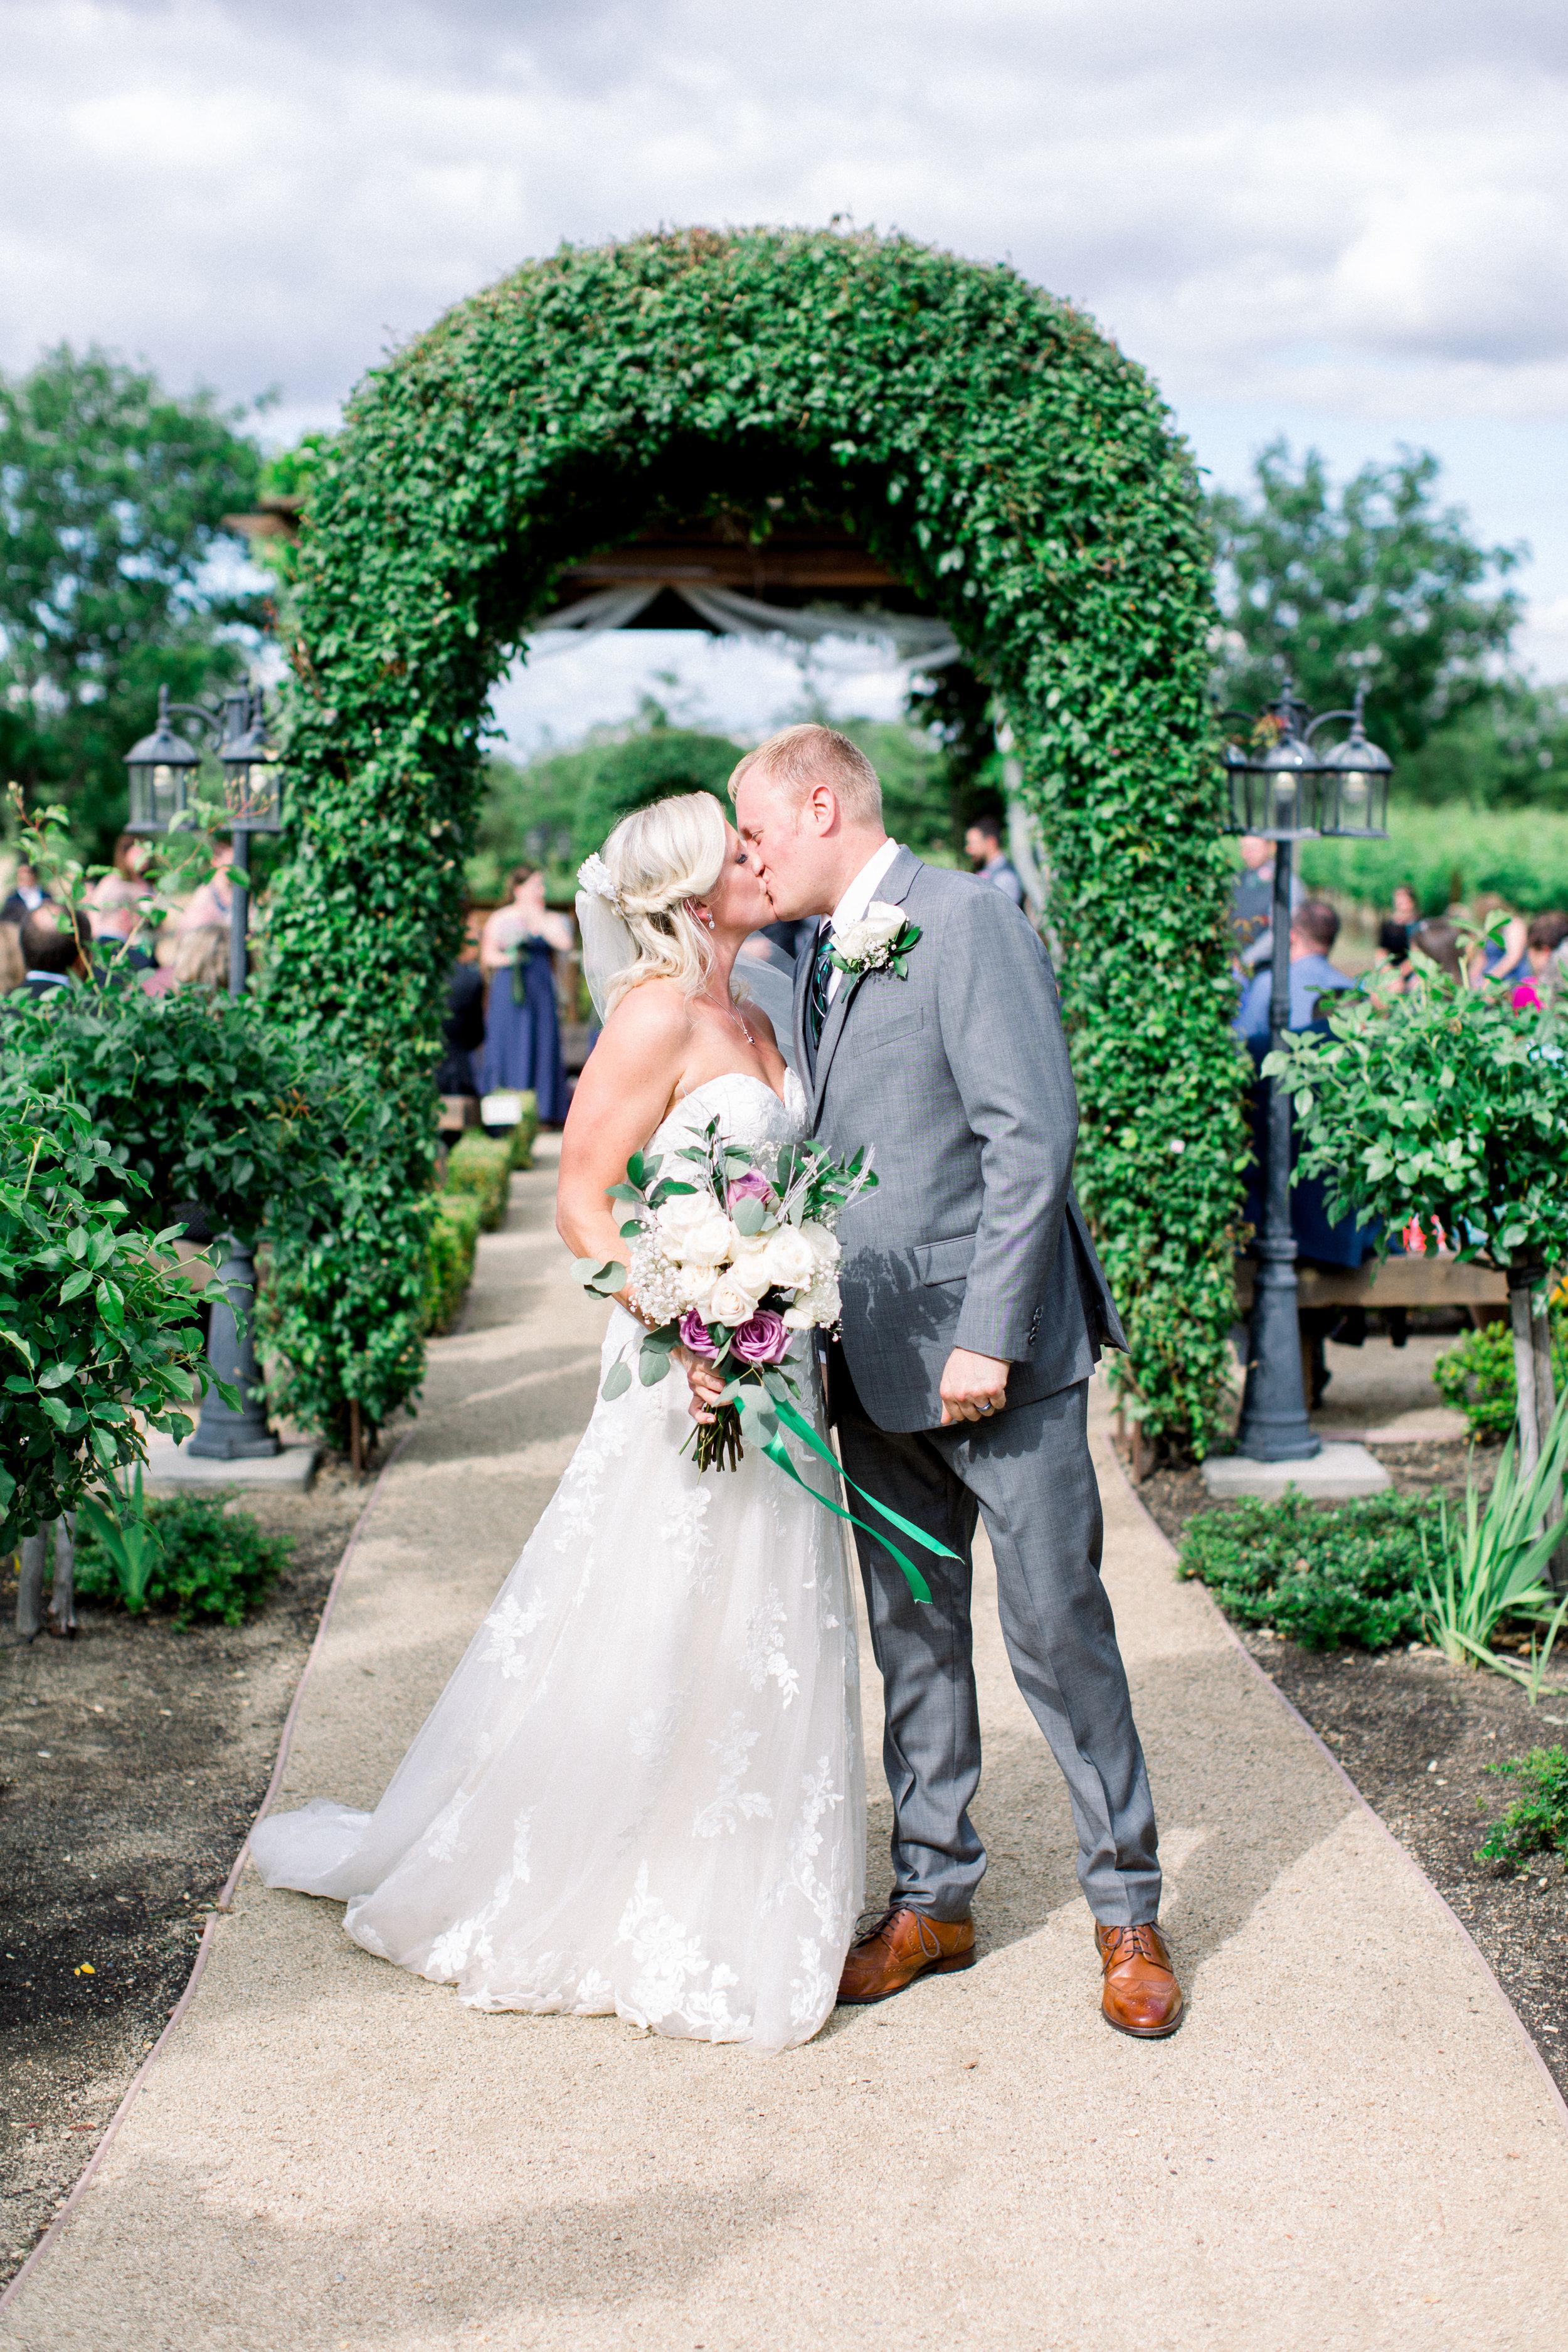 wolfe-heights-event-center-wedding-sacramento-california-wedding-18.jpg